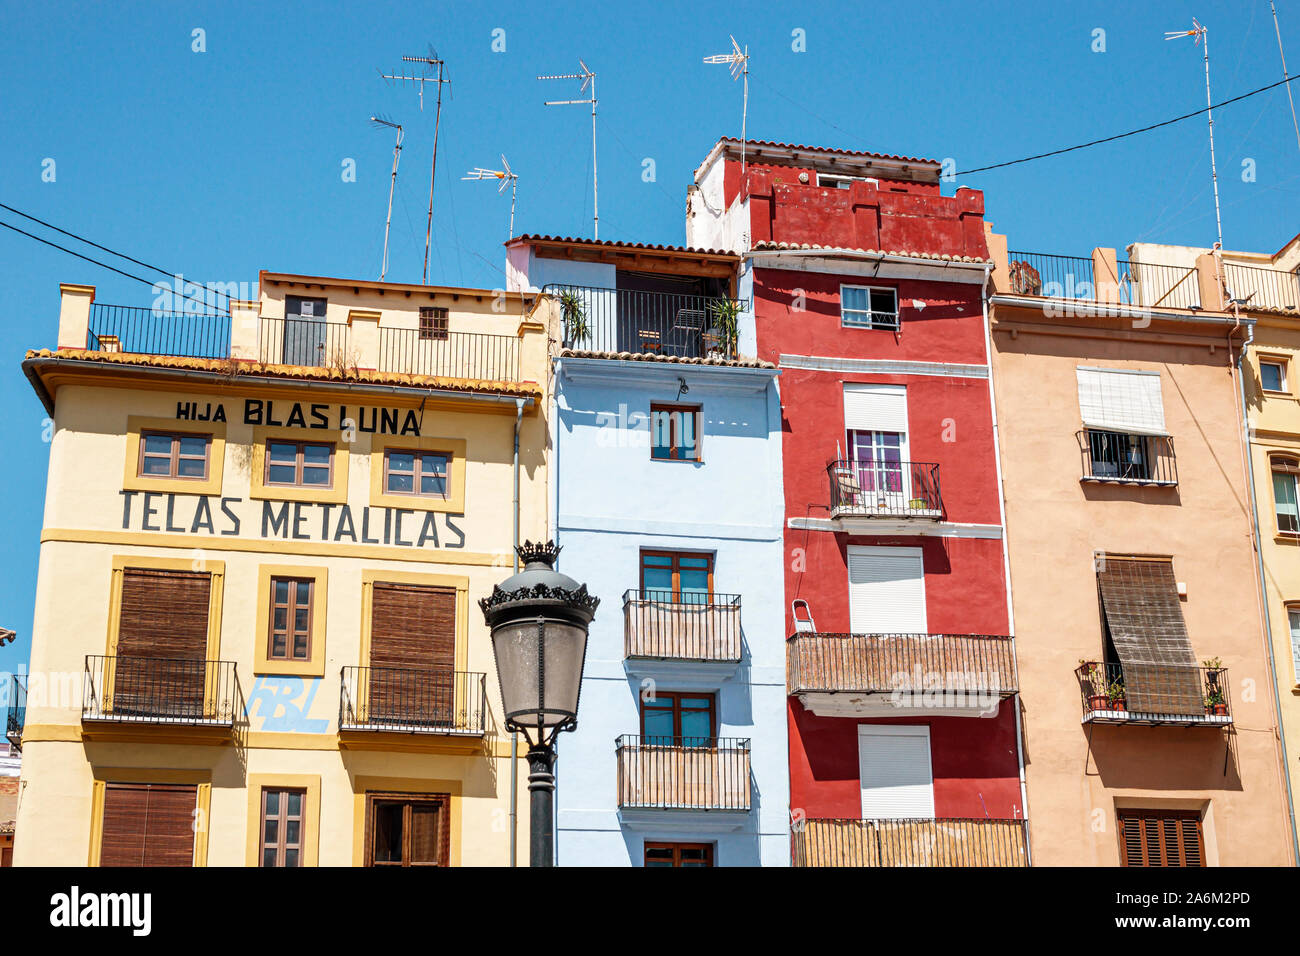 Valencia Spain Hispanic,Ciutat Vella,old city,historic center,Plaza del Dr. Doctor Collado,square,buildings,apartments residences,balconies,facades,la Stock Photo